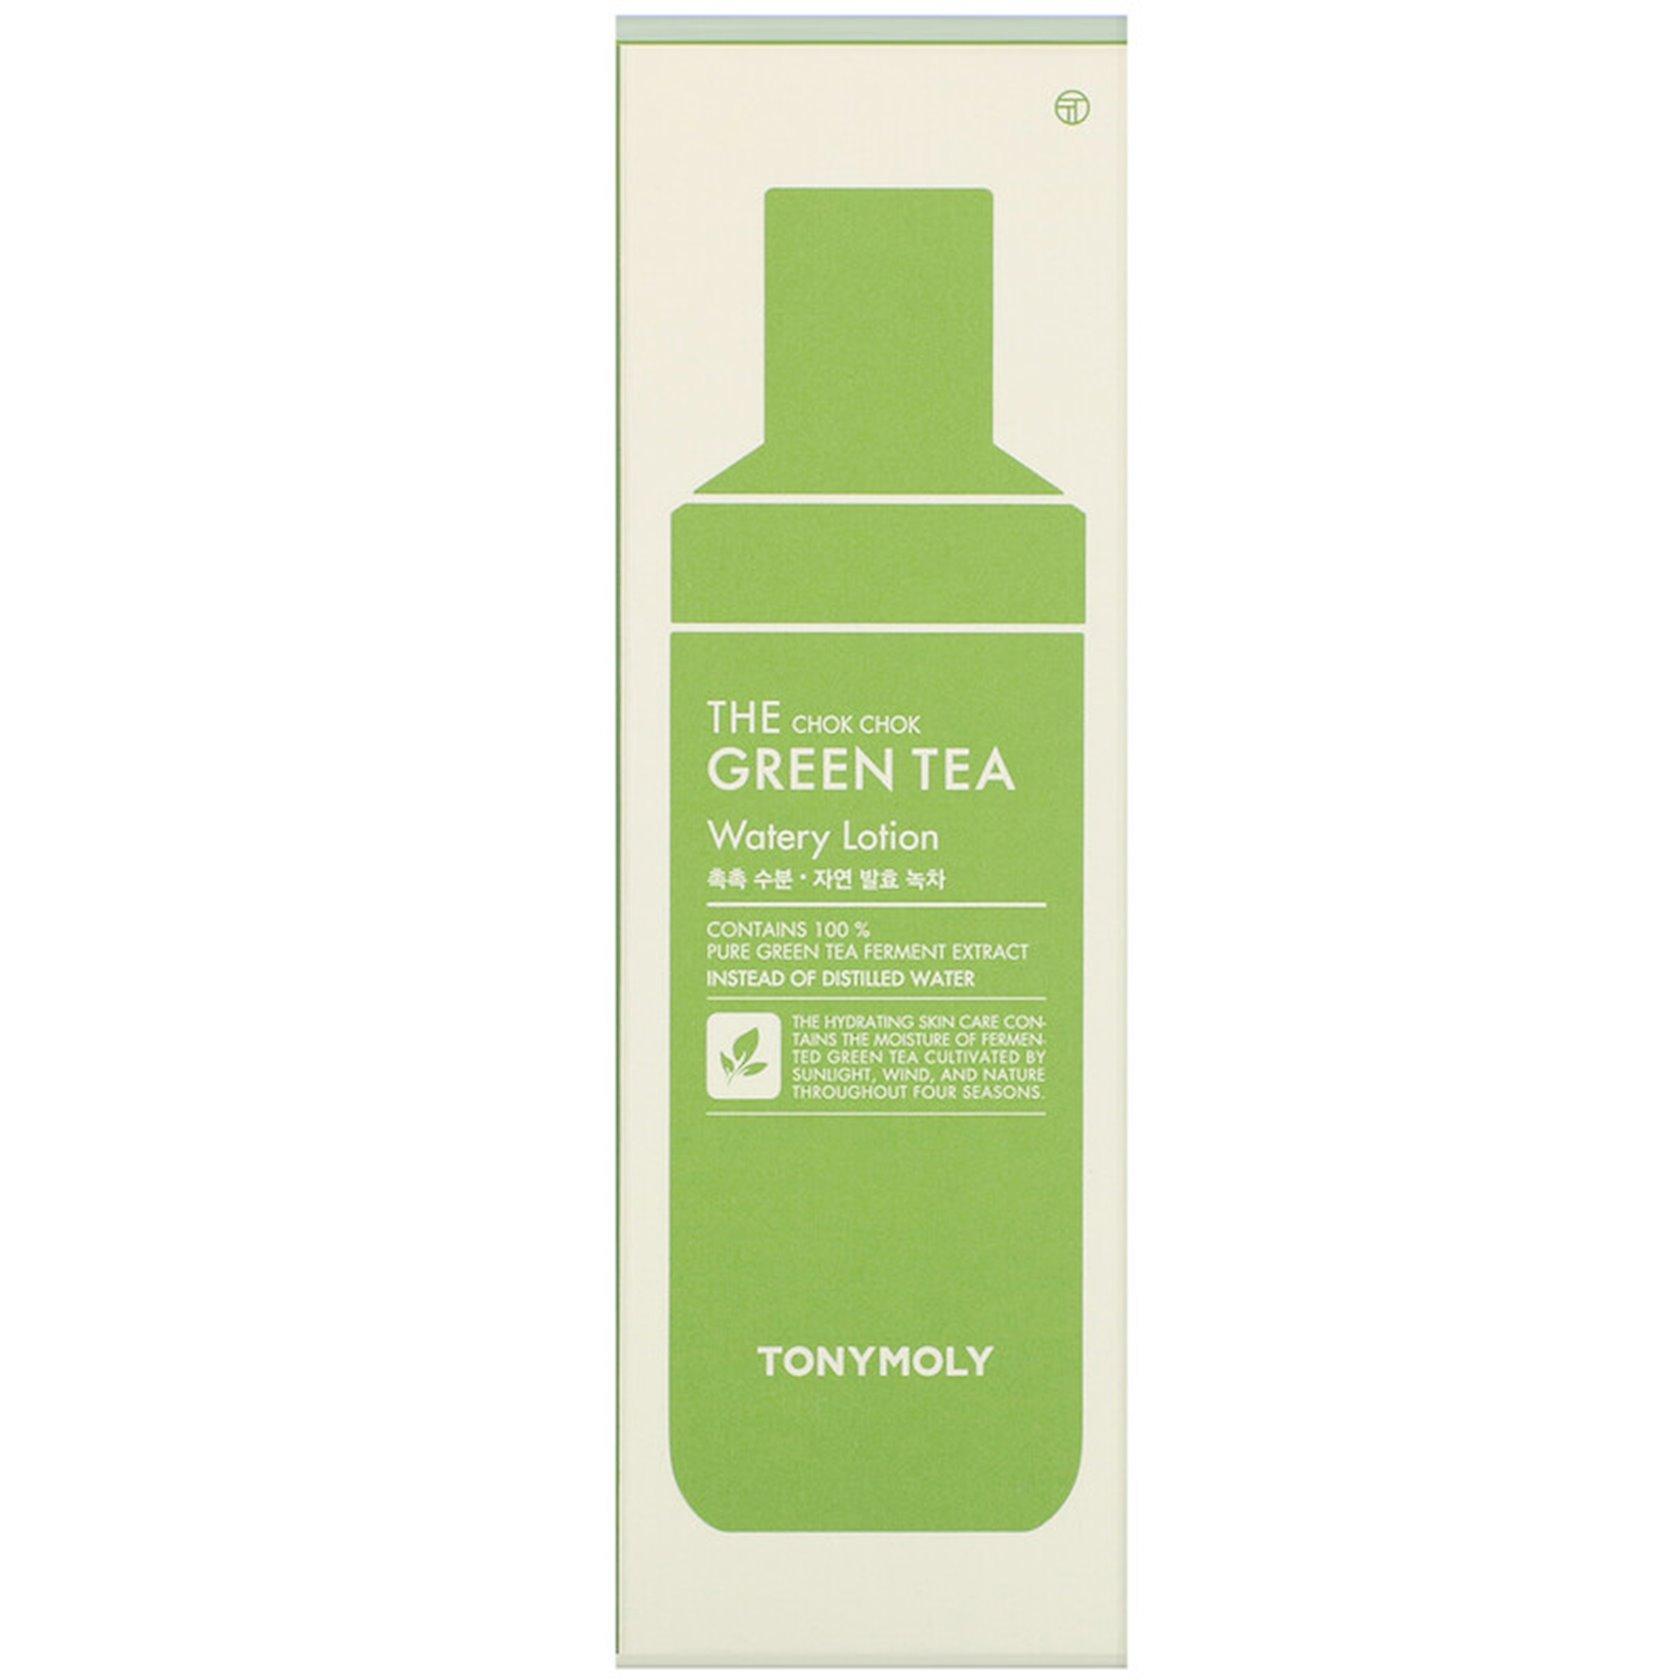 Üz üçün losyon Tony Moly The Chok Chok Green Tea Watery Lotion